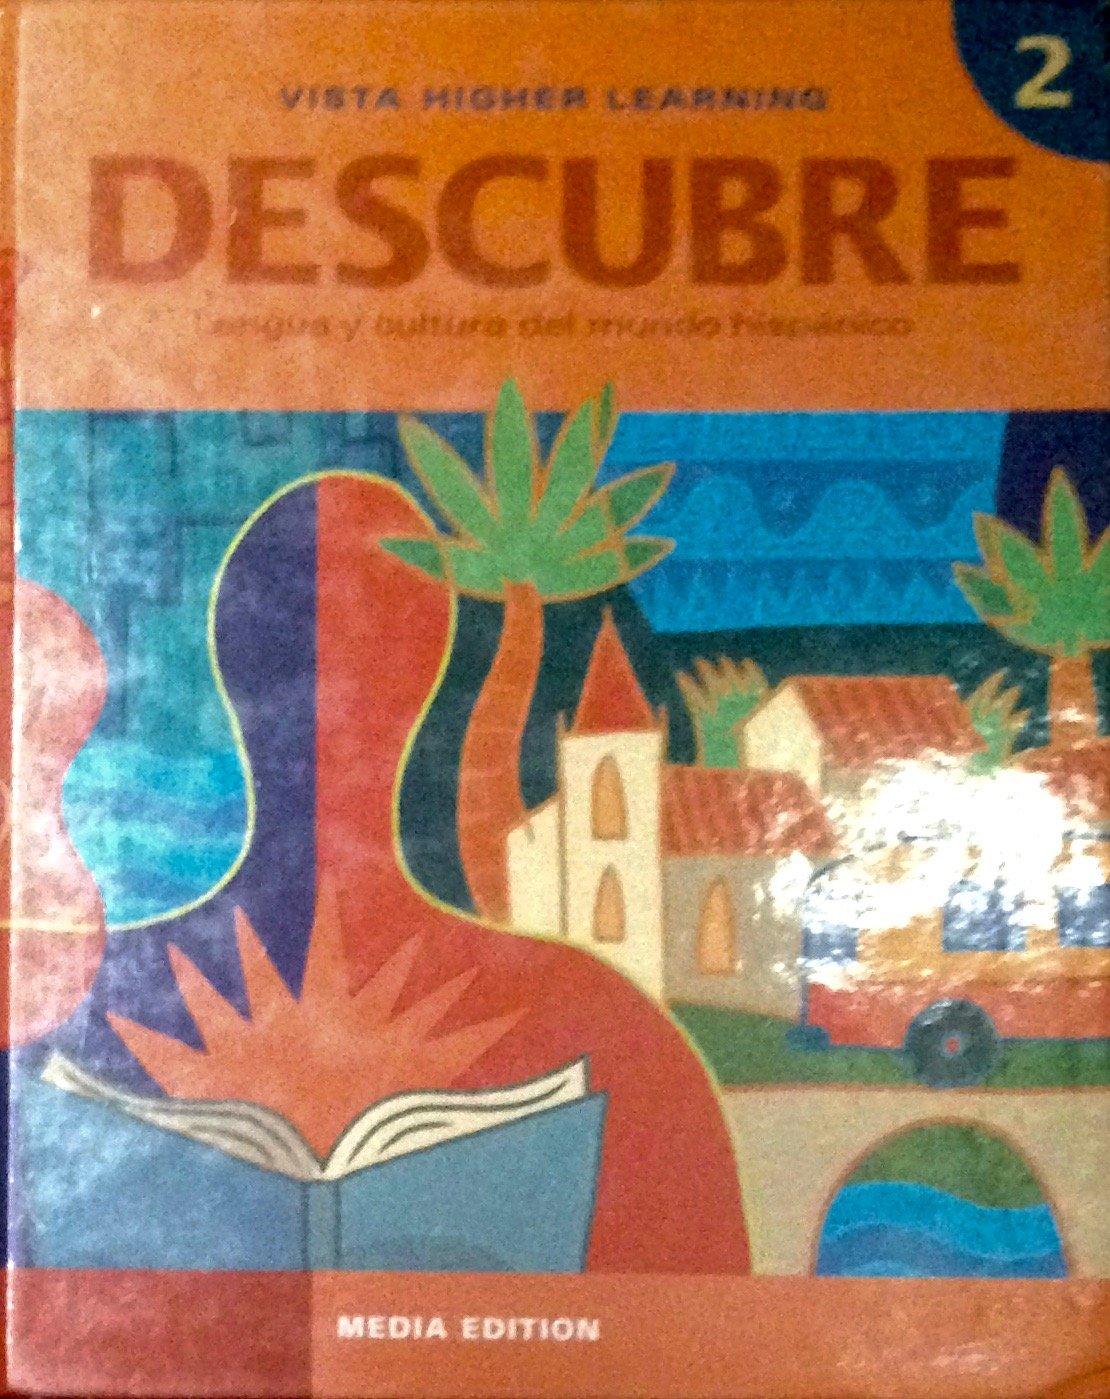 Descubre 2 Media Edition - Student Edition, vText w/ Supersite Code ebook